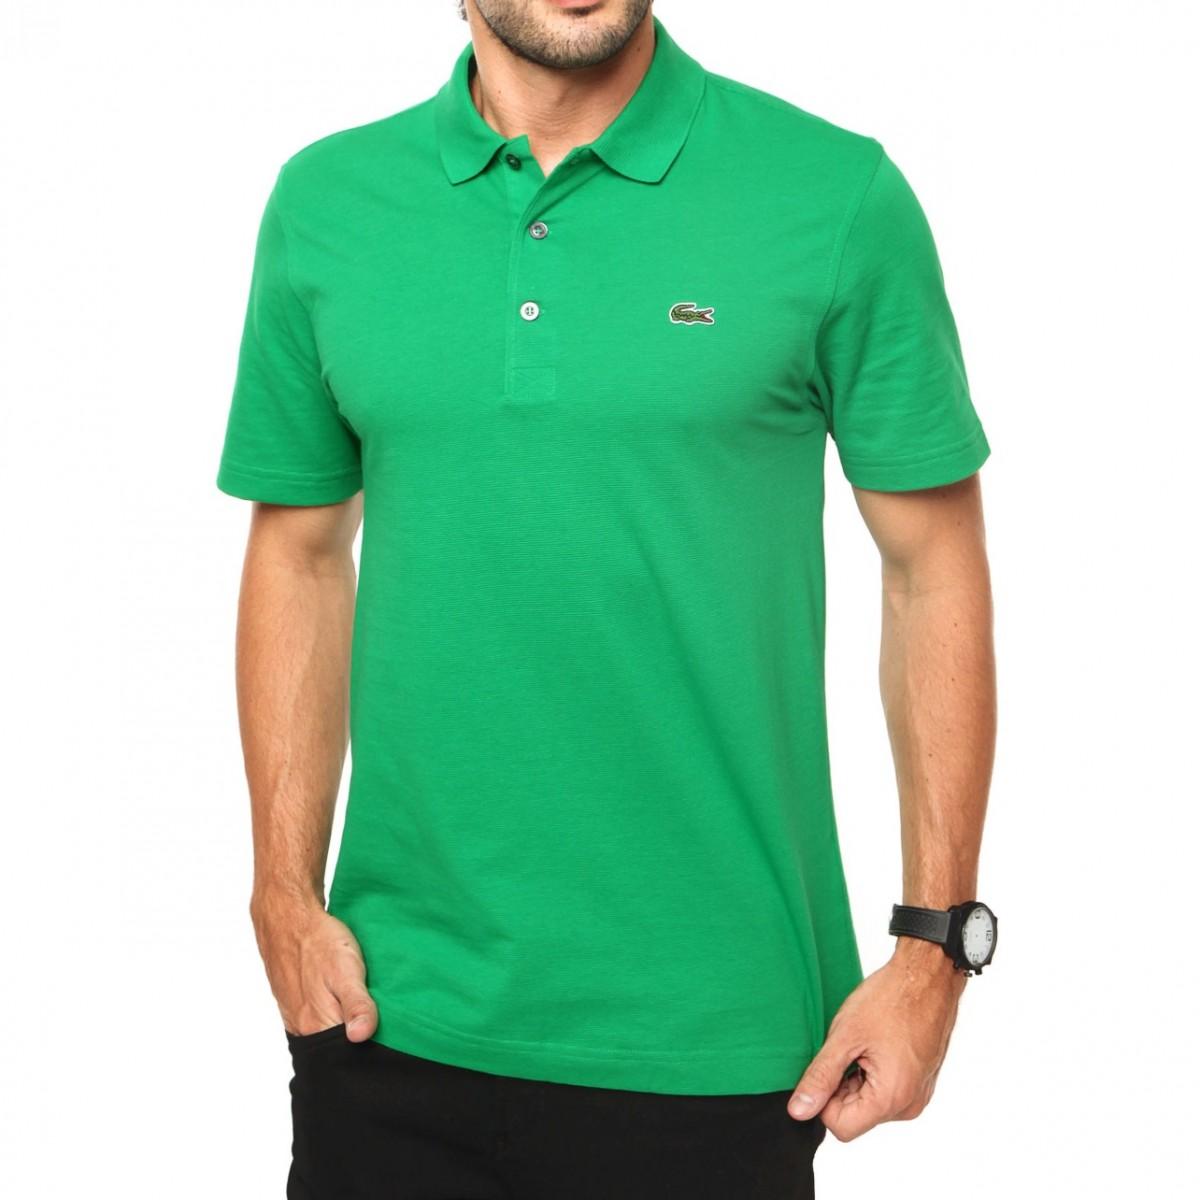 56e4ac92e8 Camisa Polo Lacoste Masculino